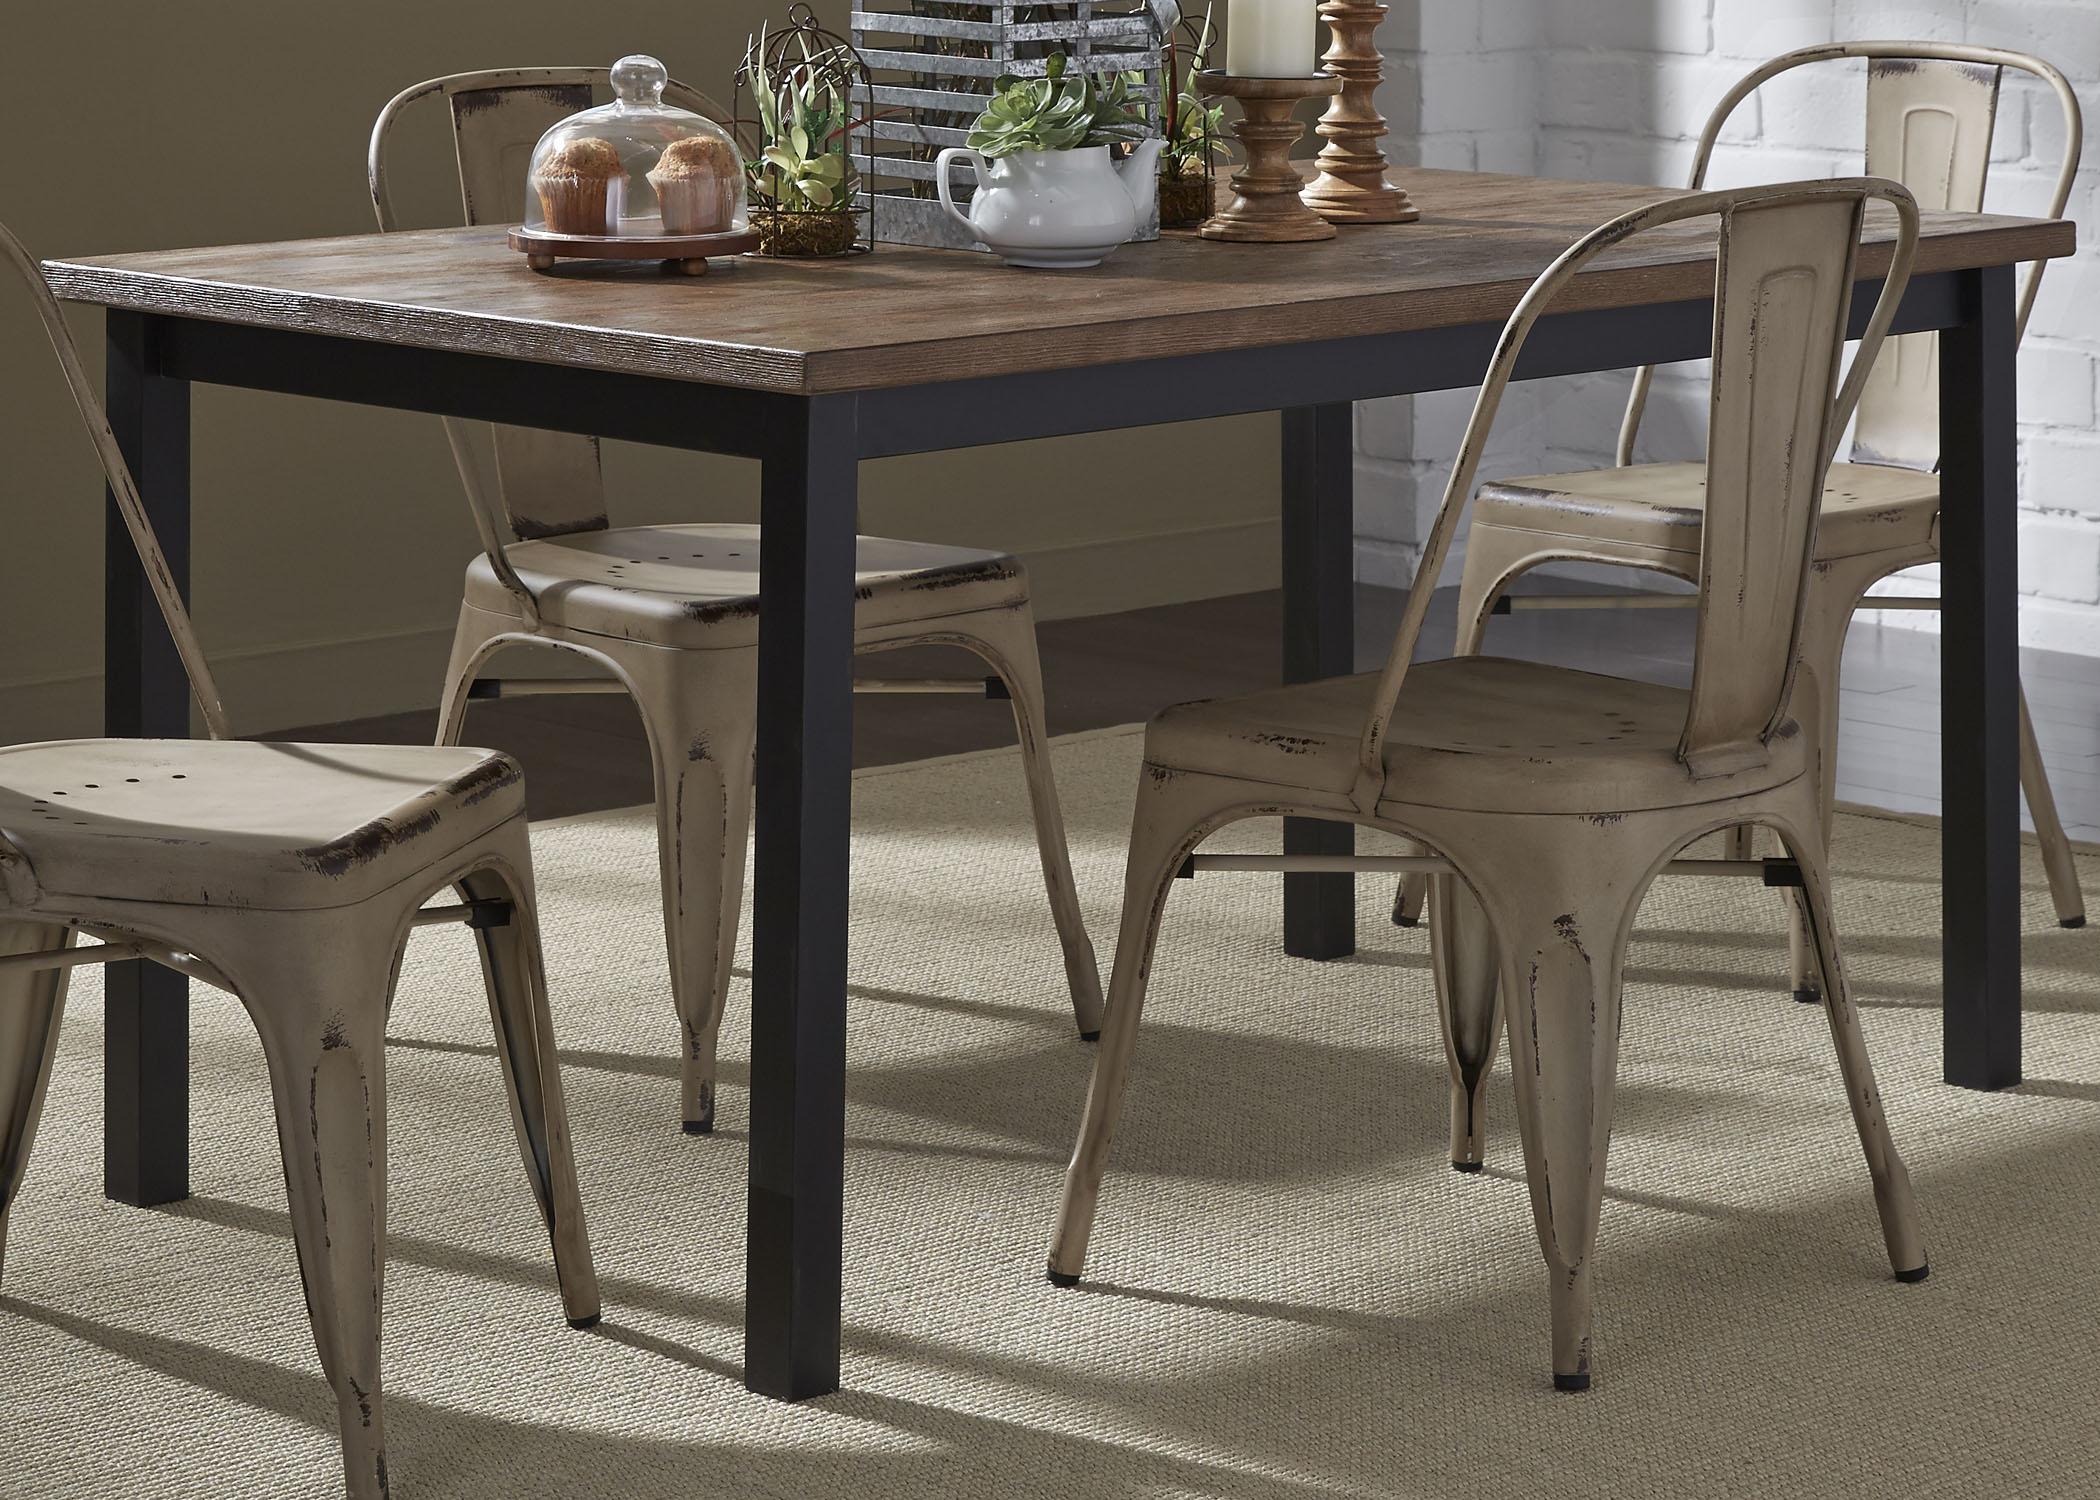 Vintage Dining Series Rectangular Leg Table By Vendor 5349 At Becker Furniture World